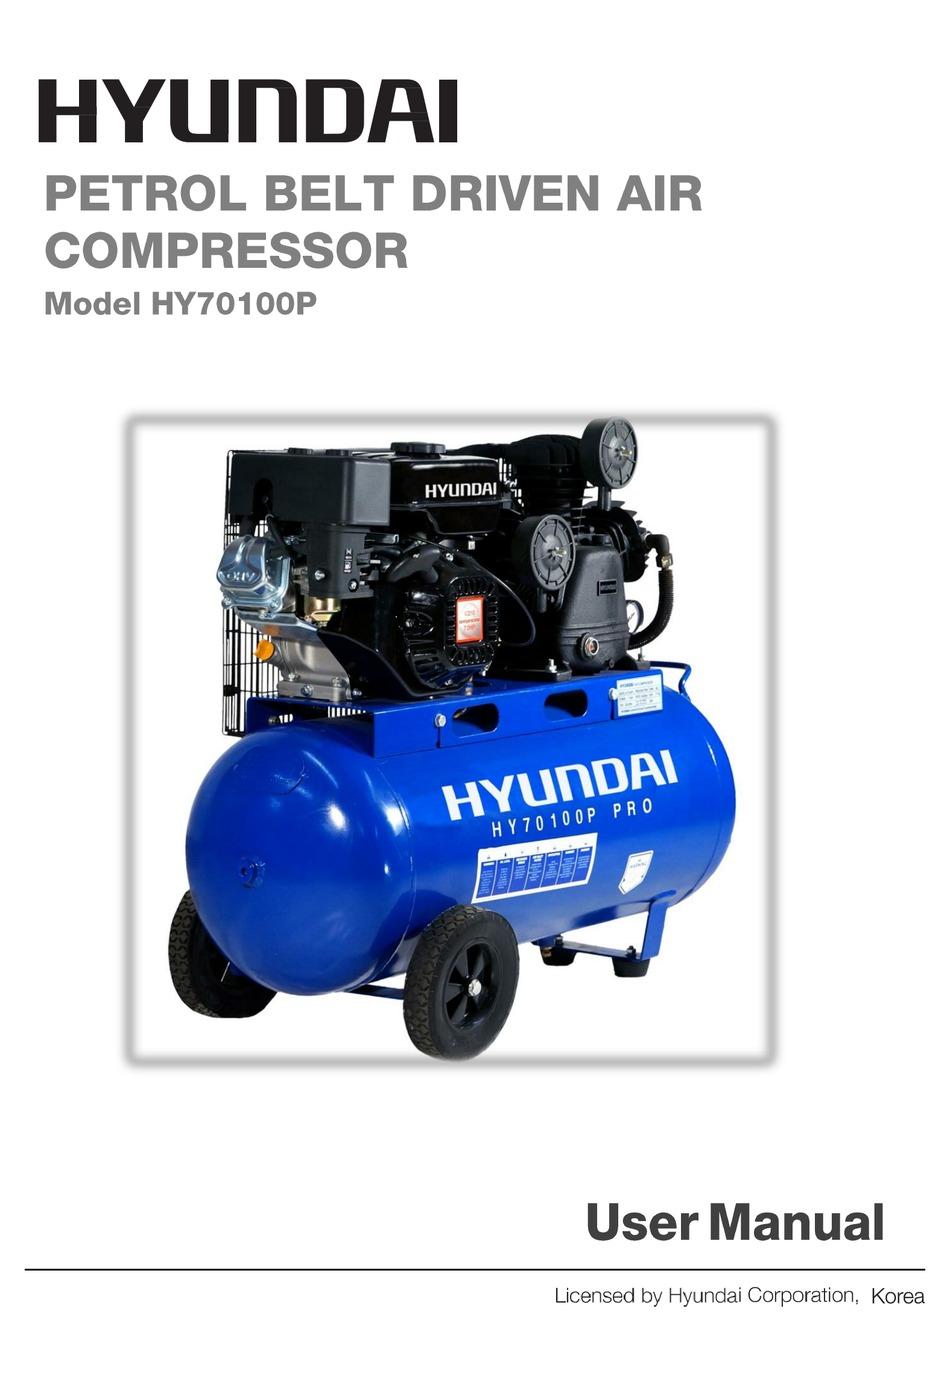 Air Compressor Hyundai Portal or Professional 90 LTR 15CFM 7 HP PETROL HY70100P